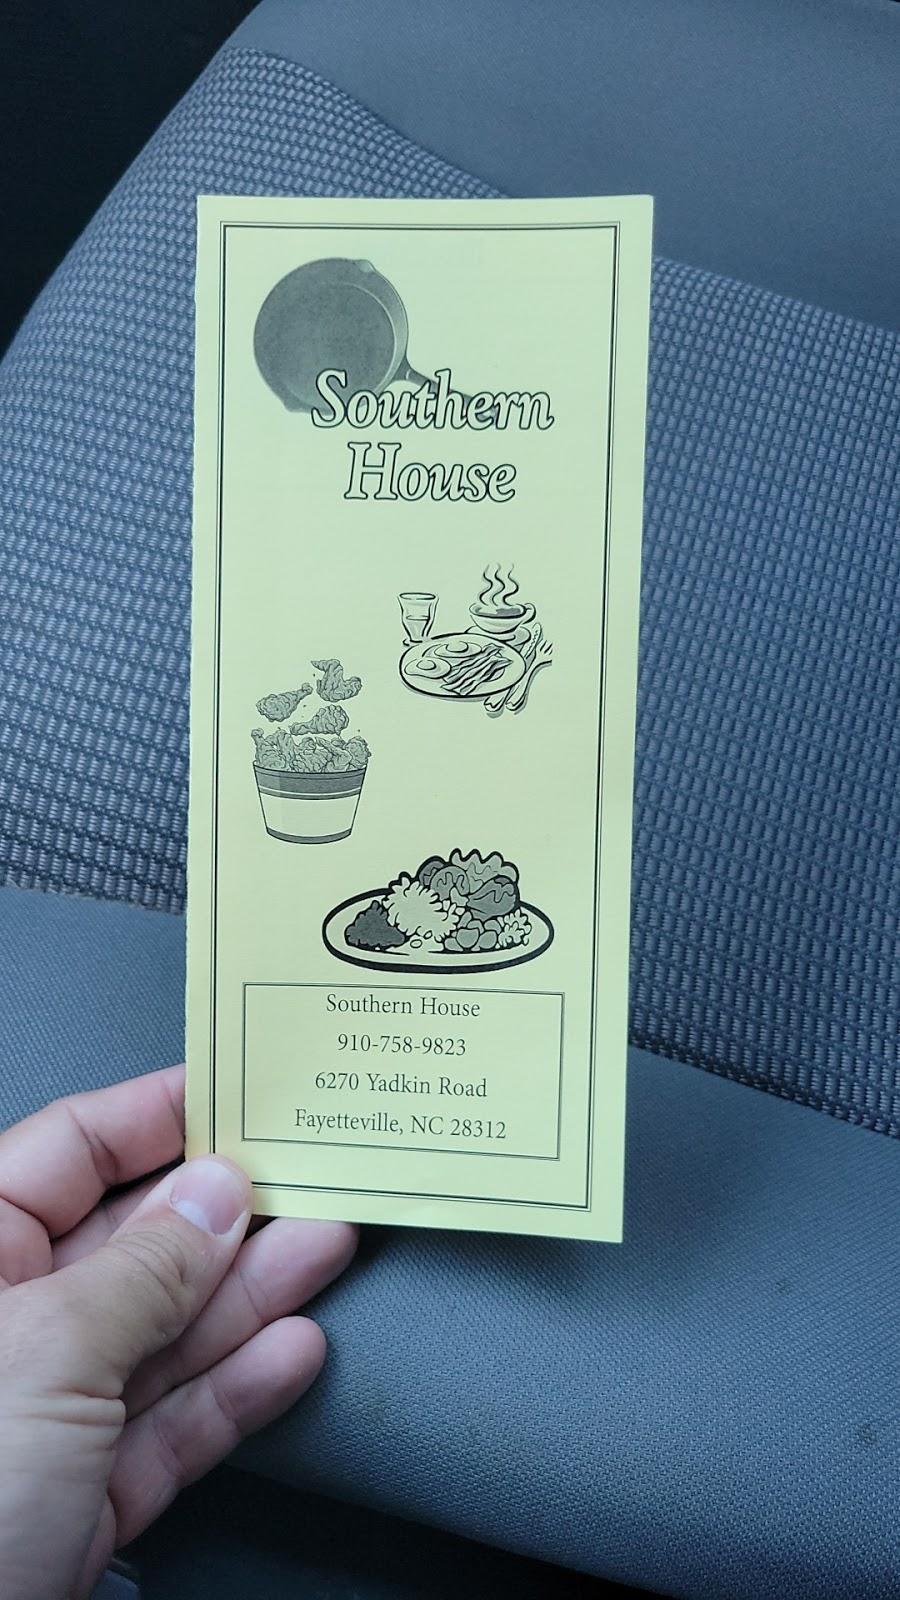 Southern House   restaurant   6270 Yadkin Rd, Fayetteville, NC 28303, USA   9107589823 OR +1 910-758-9823